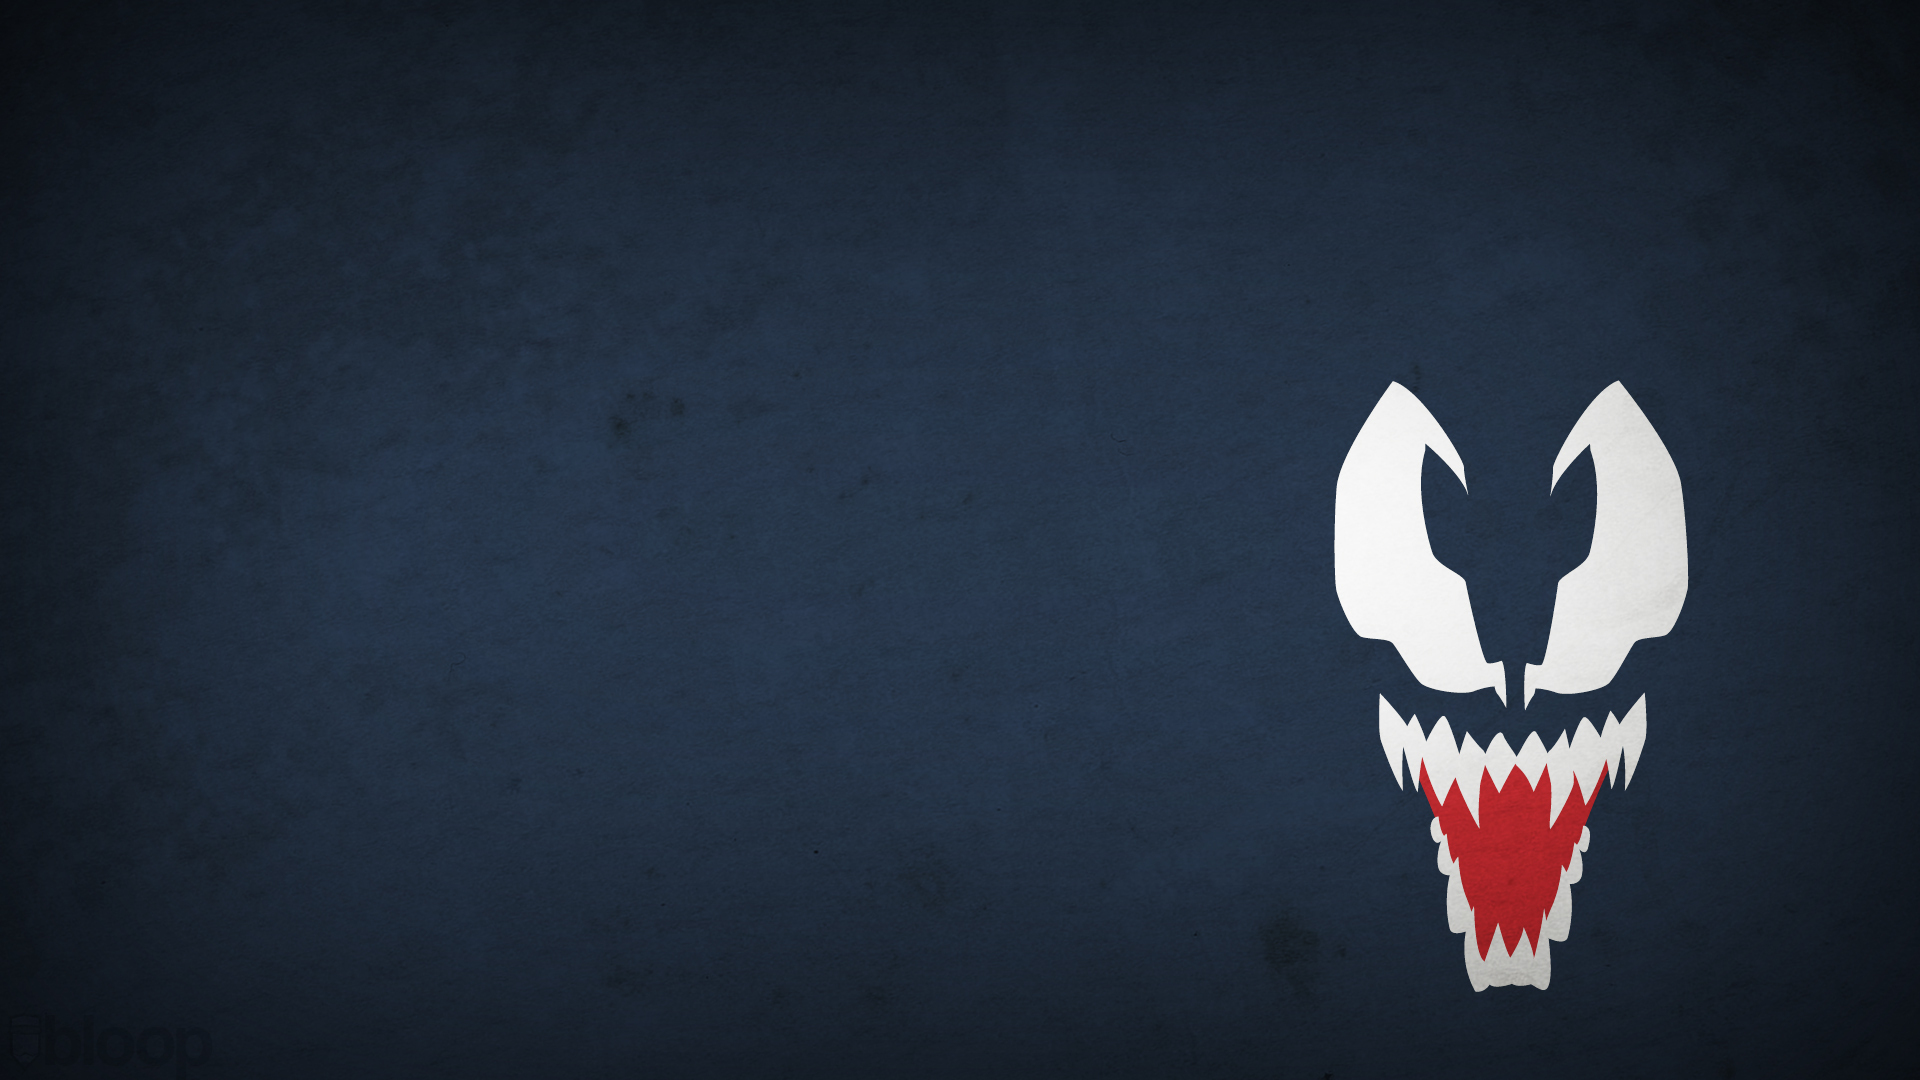 Venom vector